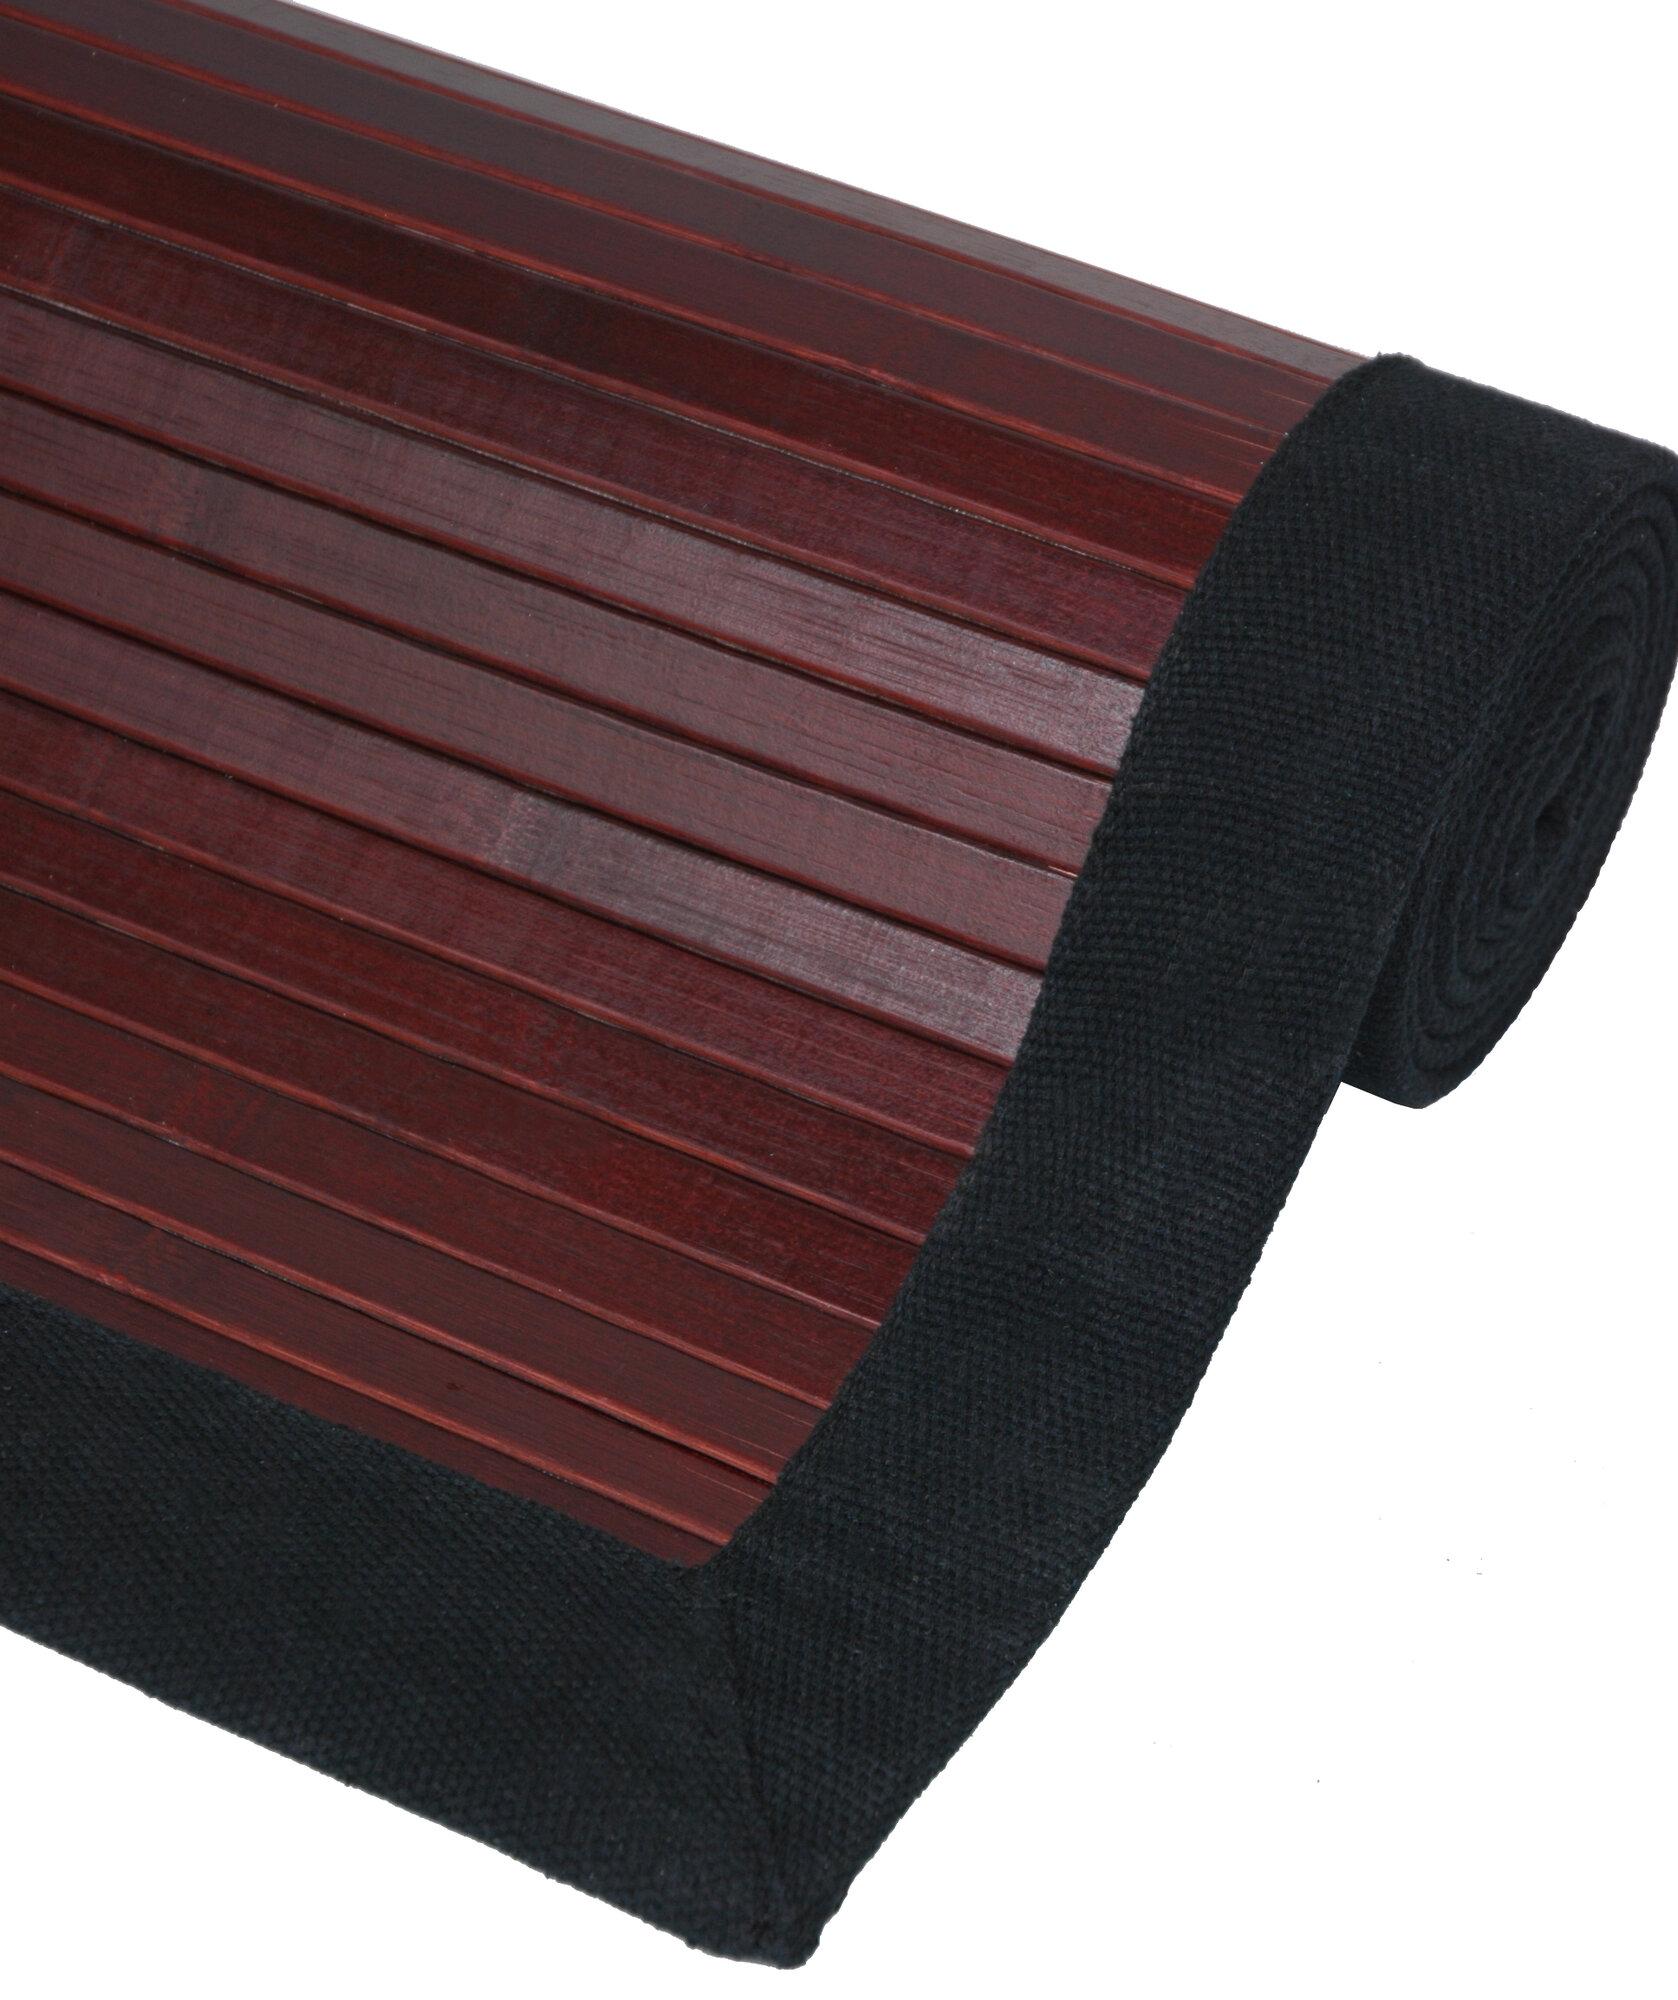 Oriental Furniture Bamboo Mahogany Area Rug